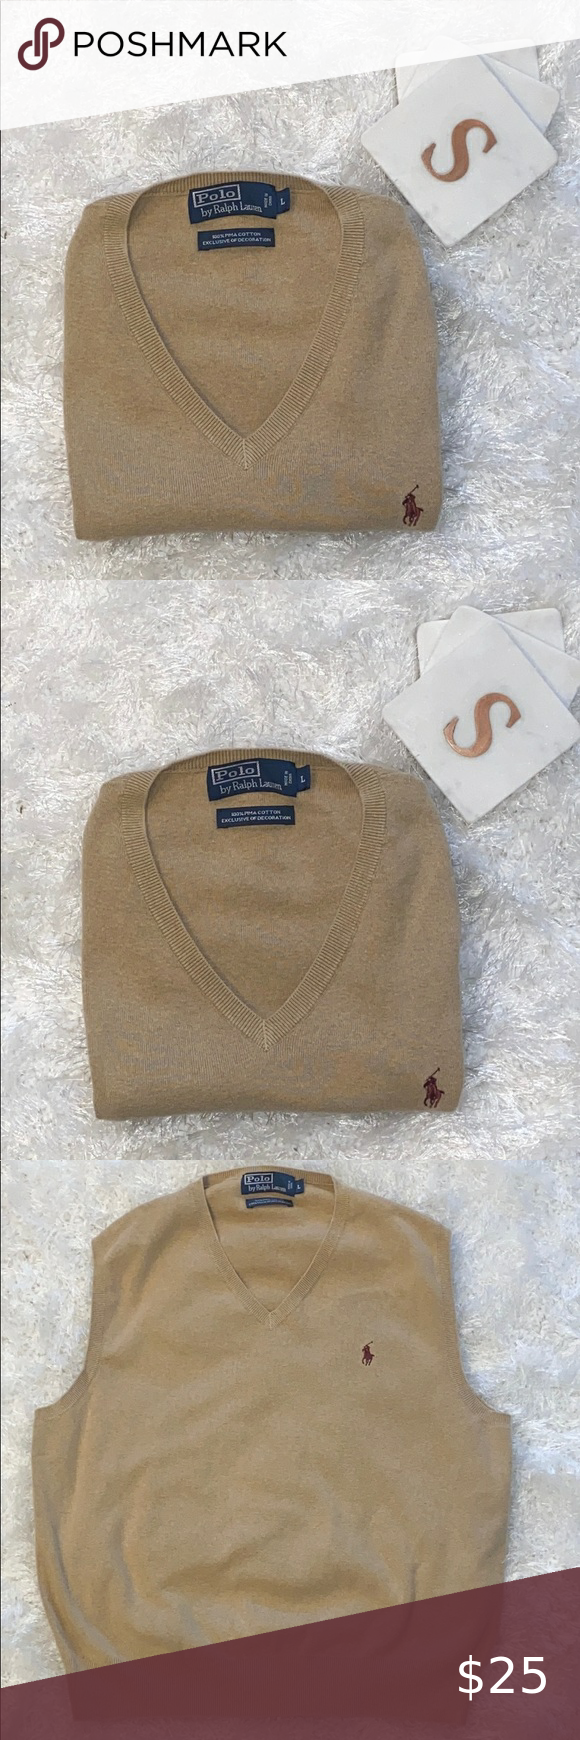 Polo Ralph Lauren Sleeveless Sweater Men Large